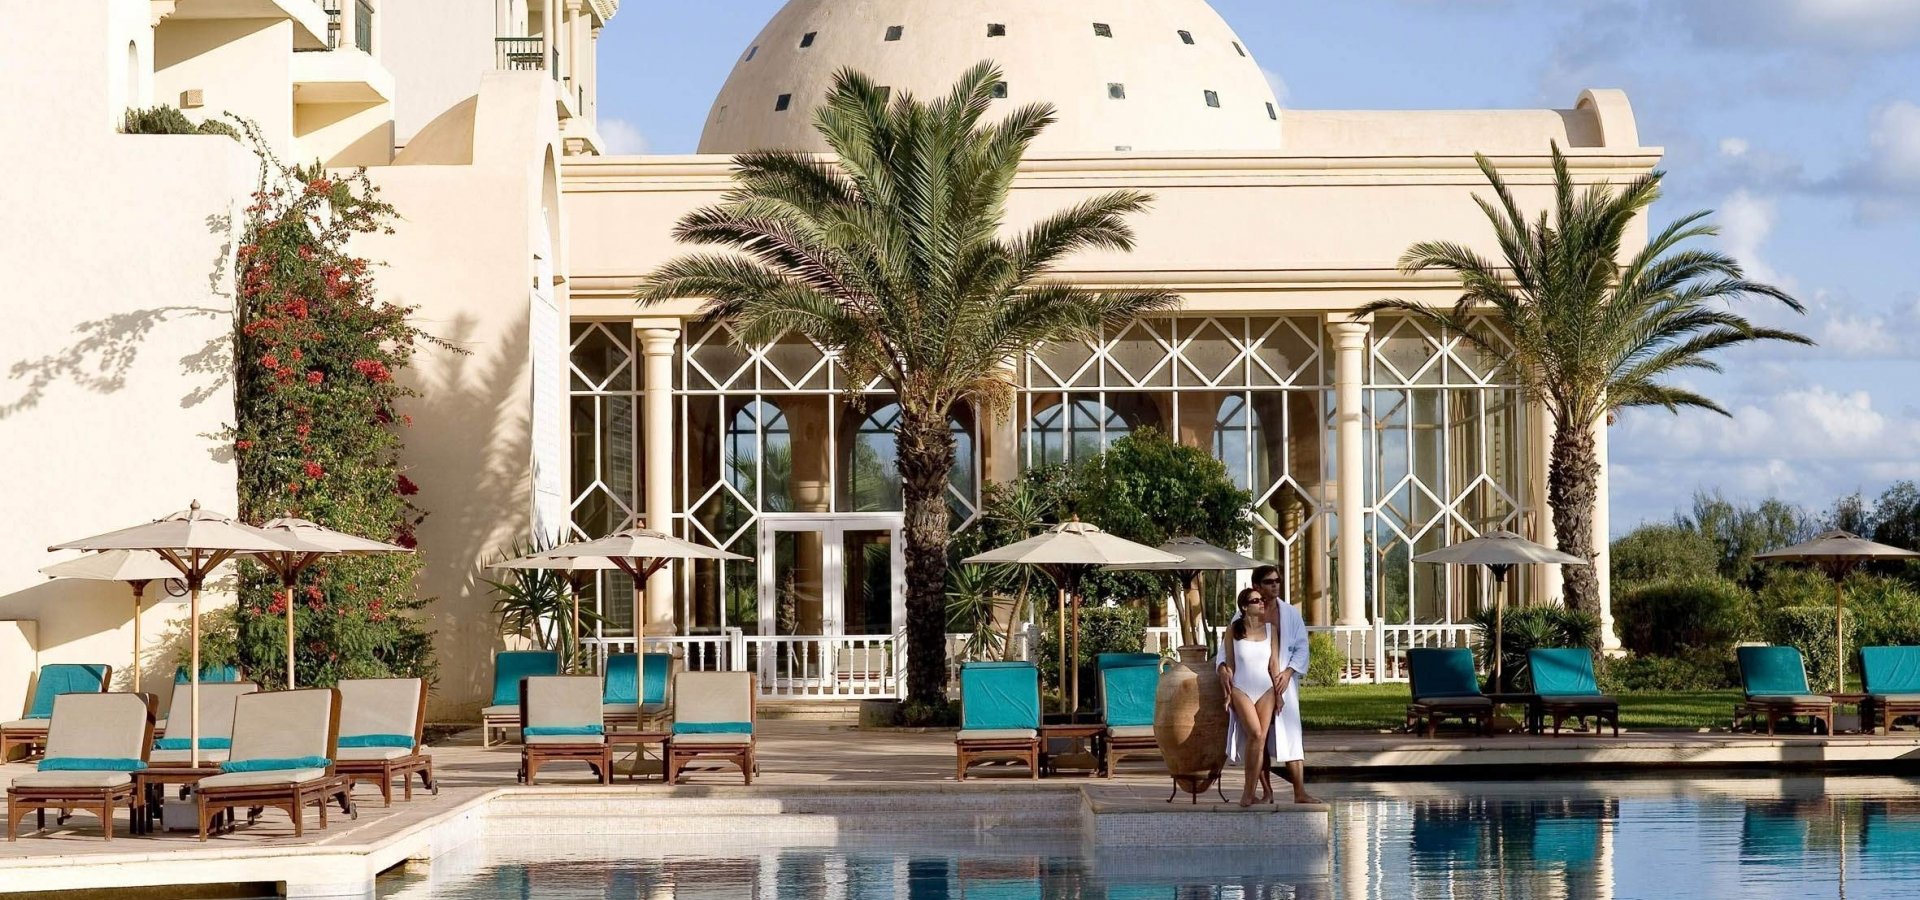 Tunez - Hotel The Residence Tunis by Cenizaro